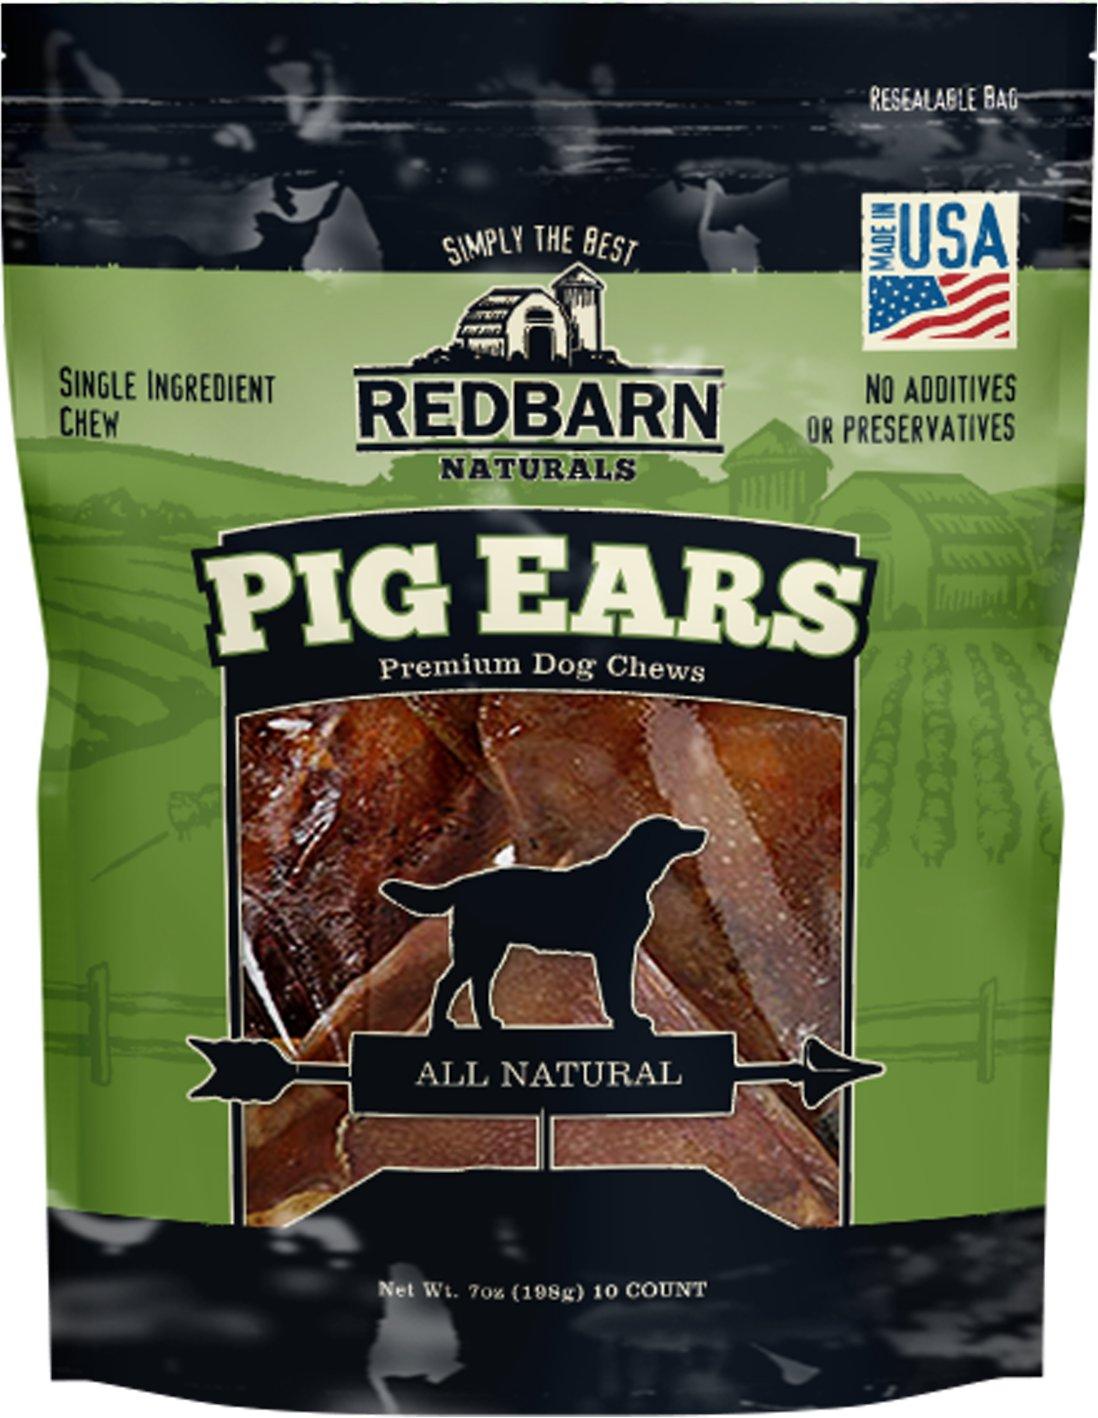 Redbarn Natural Pig Ears Dog Treats